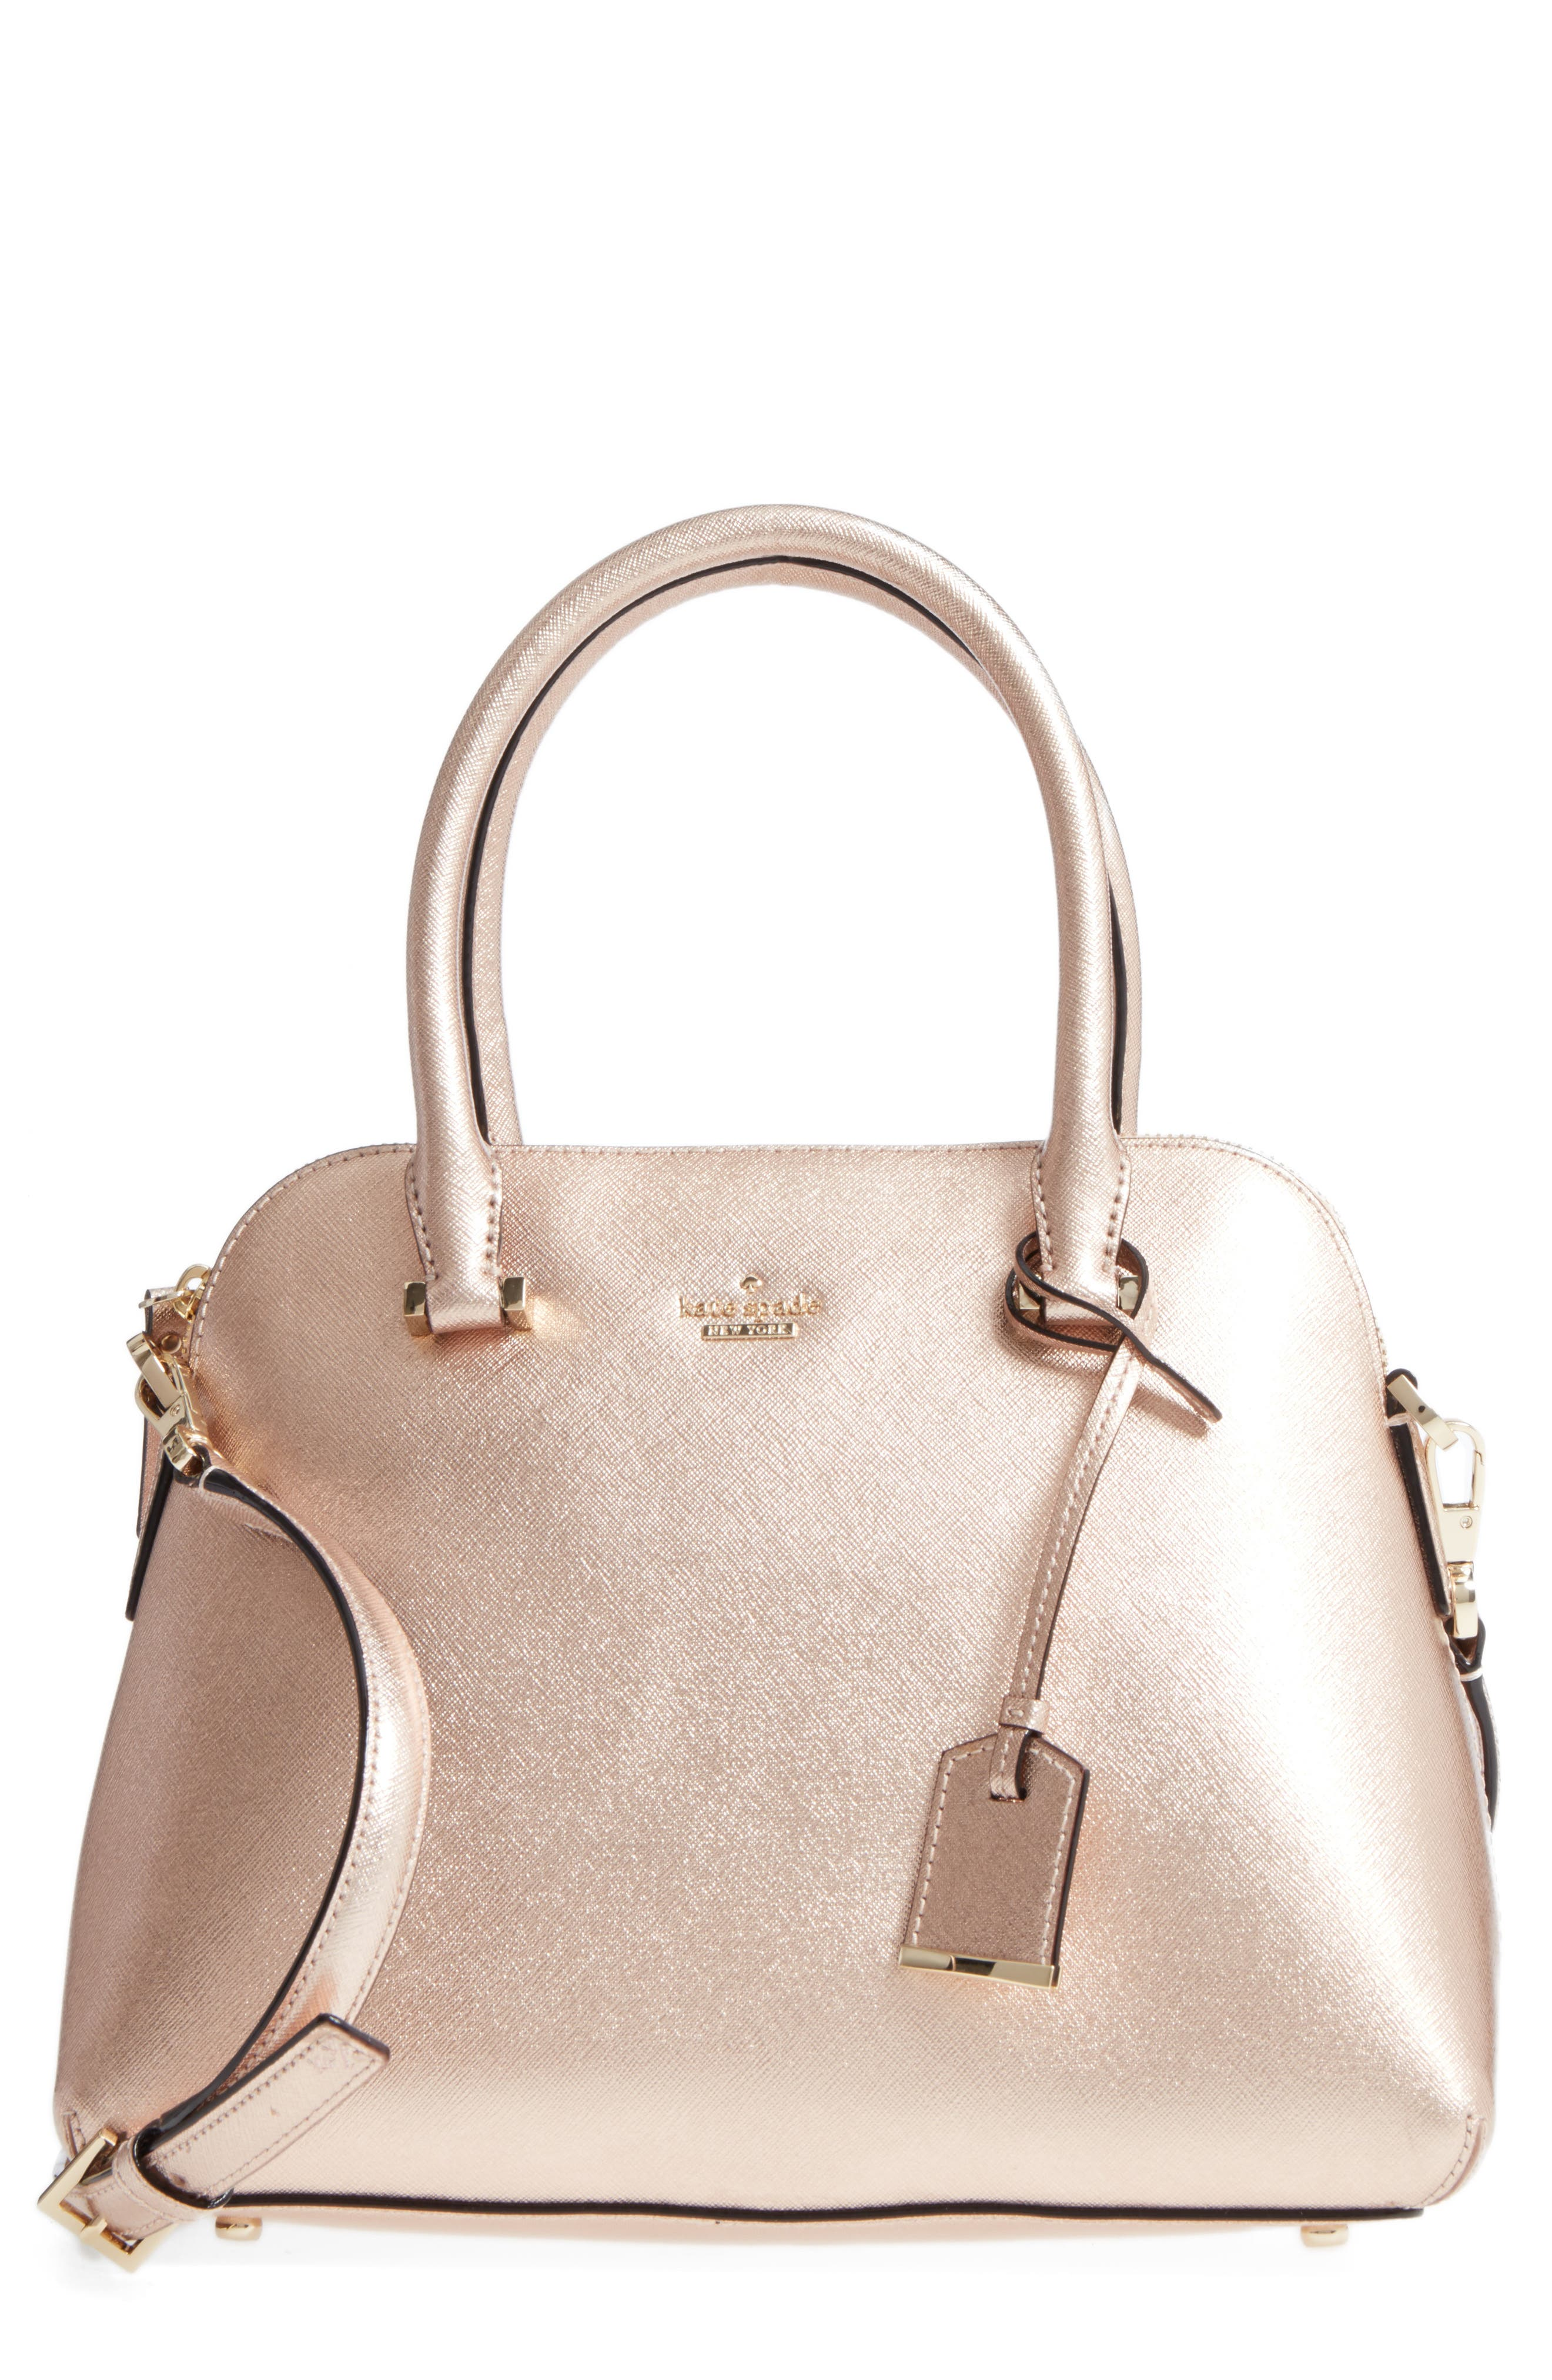 cameron street - maise satchel,                             Main thumbnail 1, color,                             650